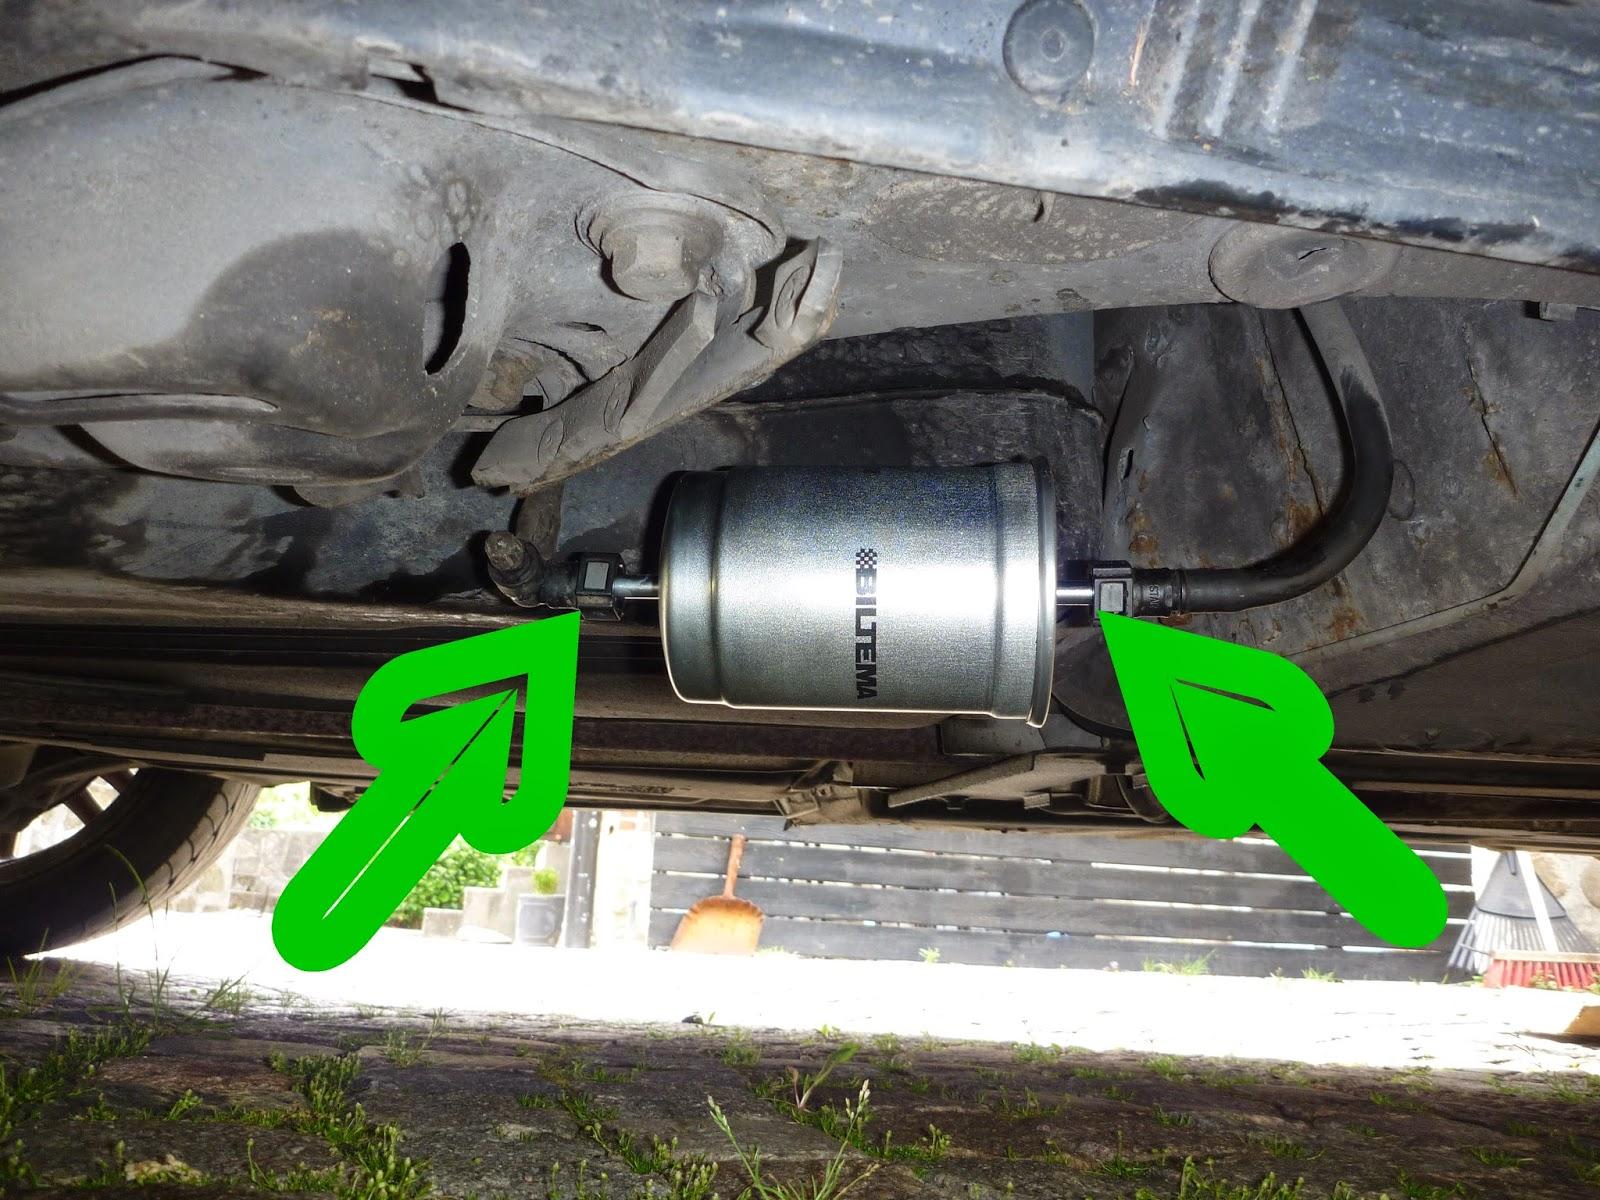 1998 volvo s70 fuel filter location